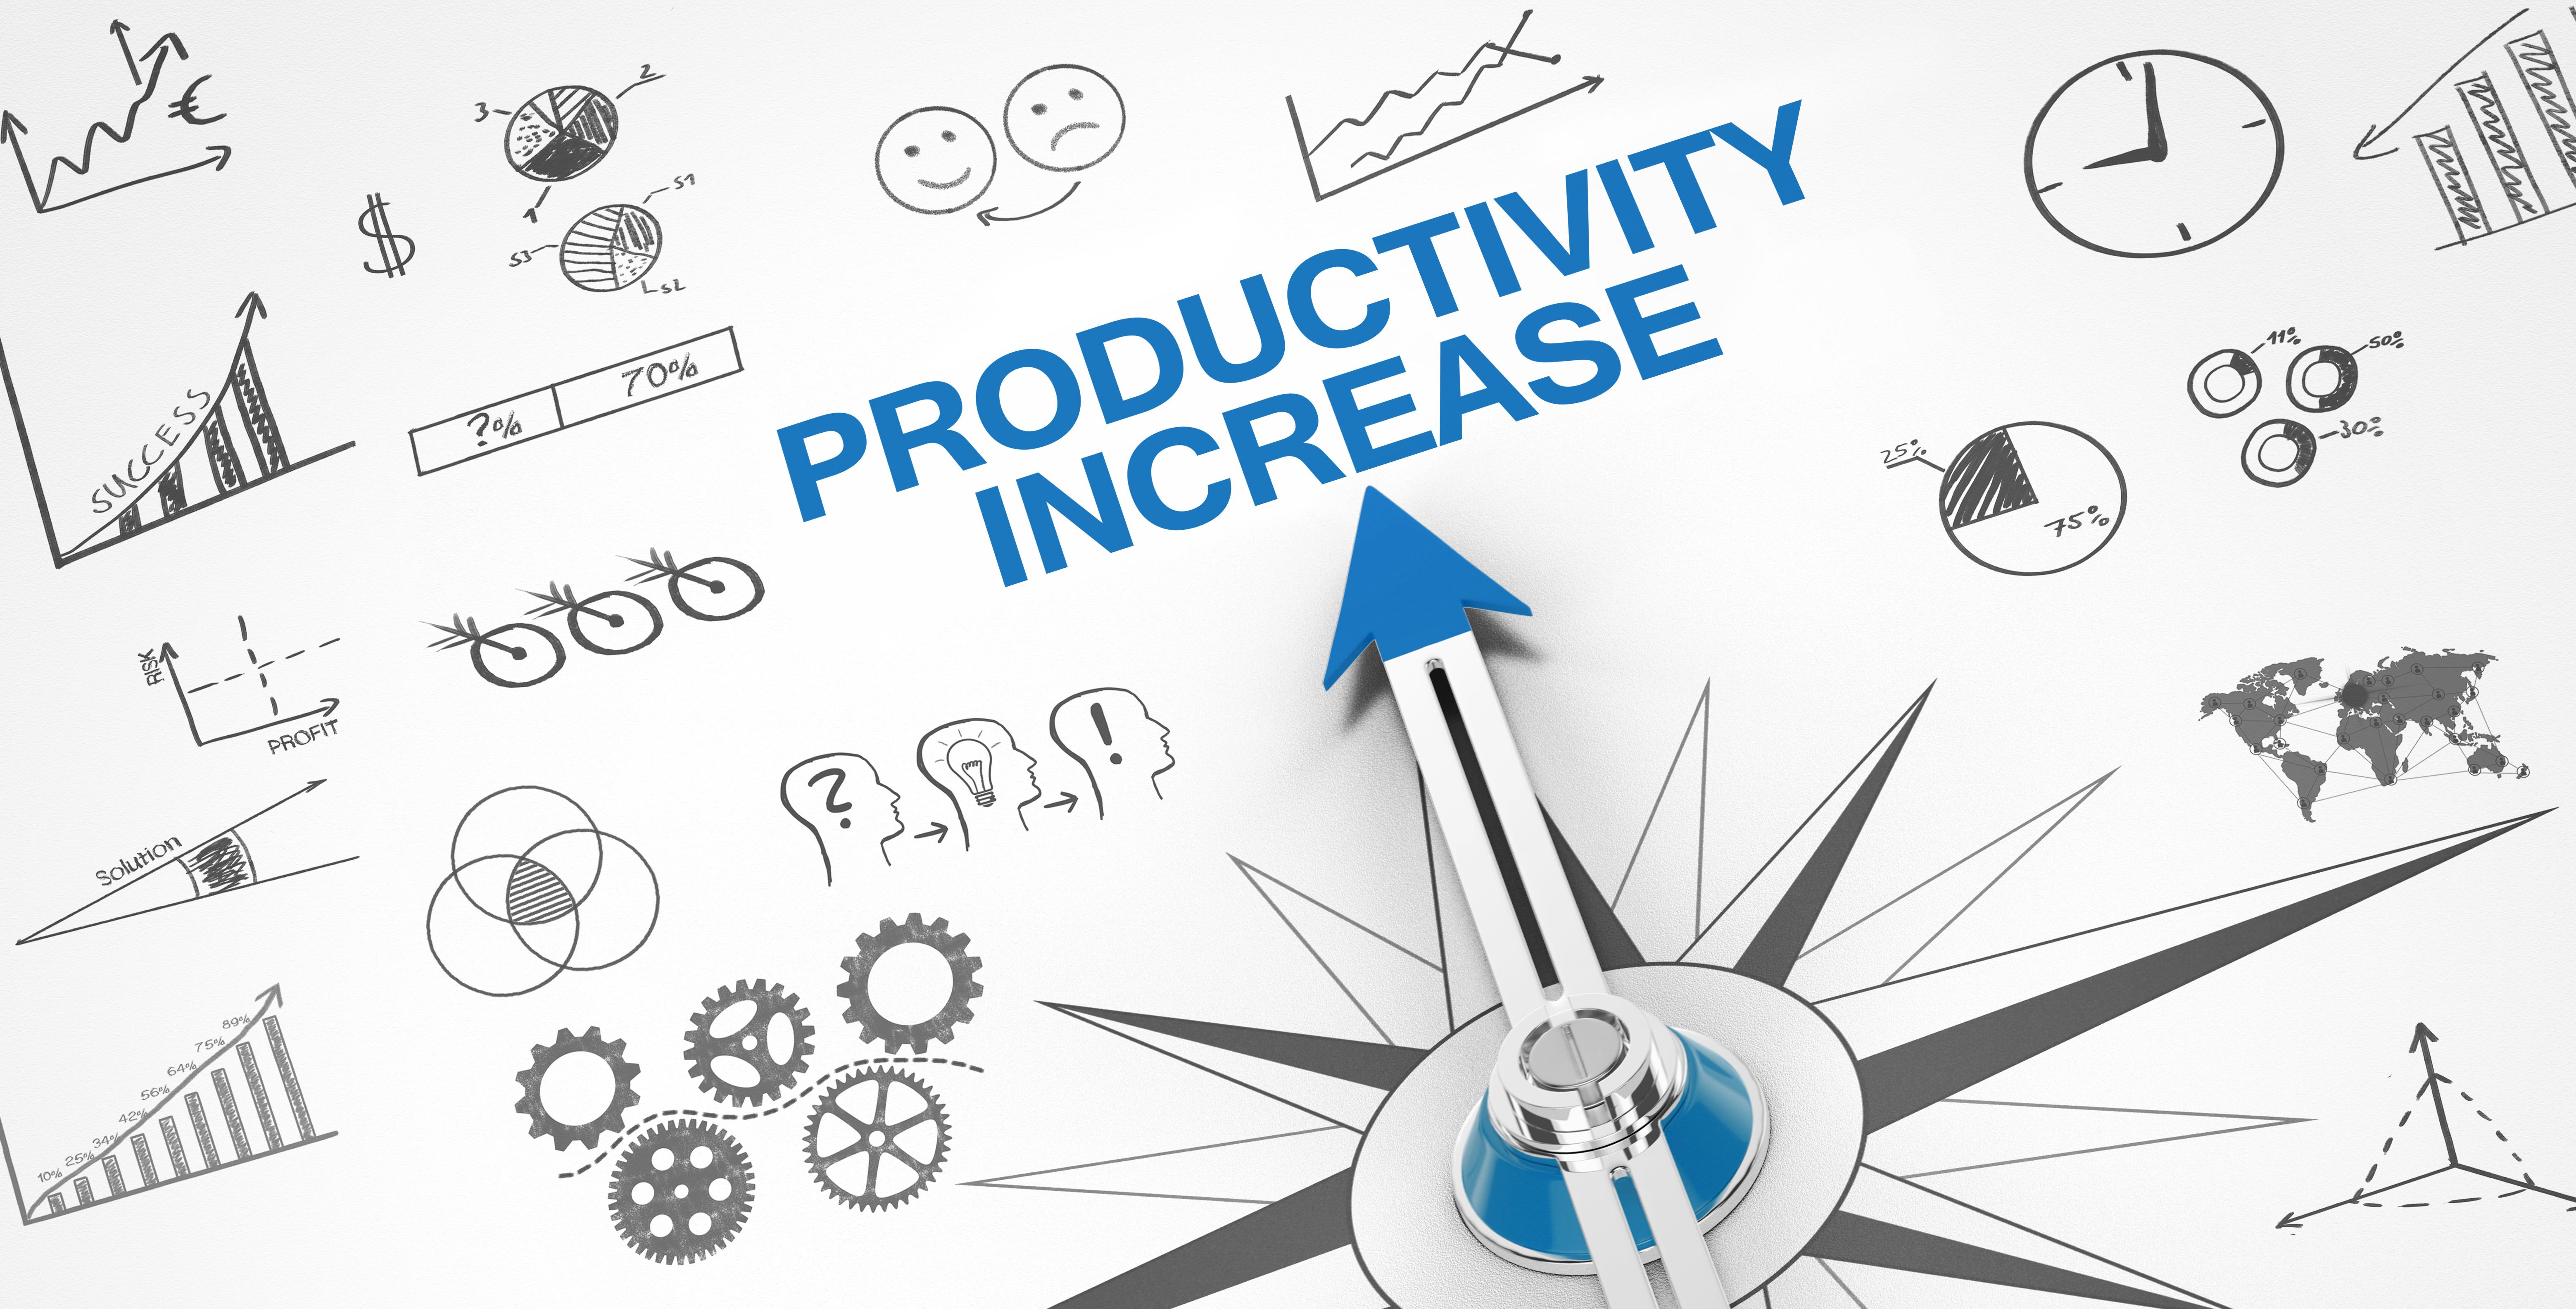 performance storyboard Productivity increase